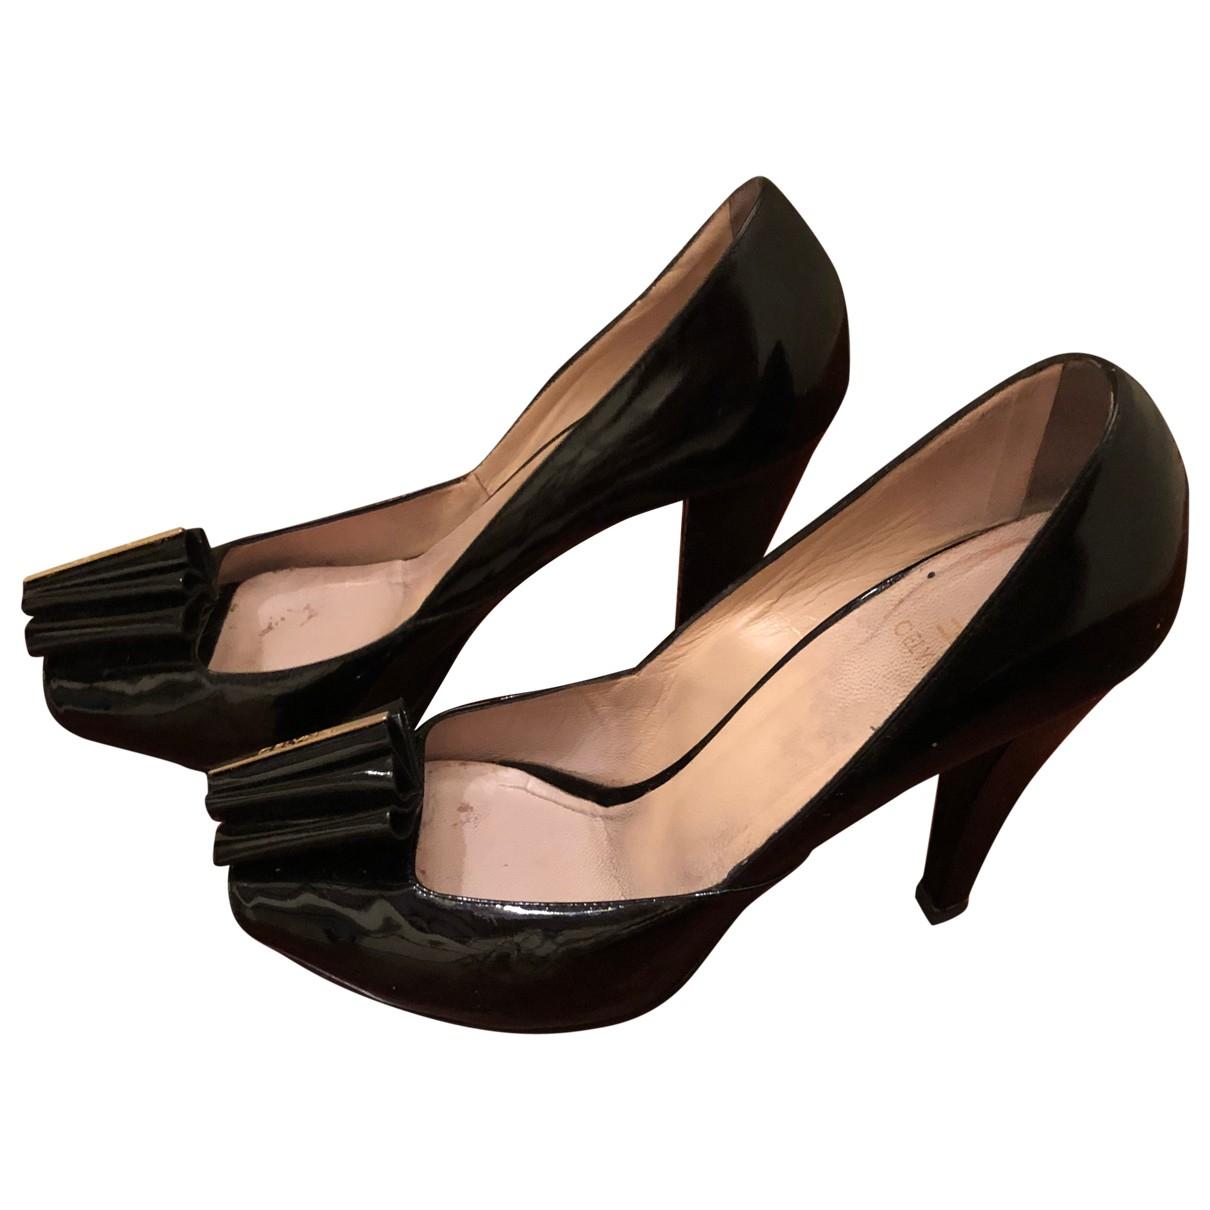 Elisabetta Franchi \N Black Patent leather Heels for Women 39 EU